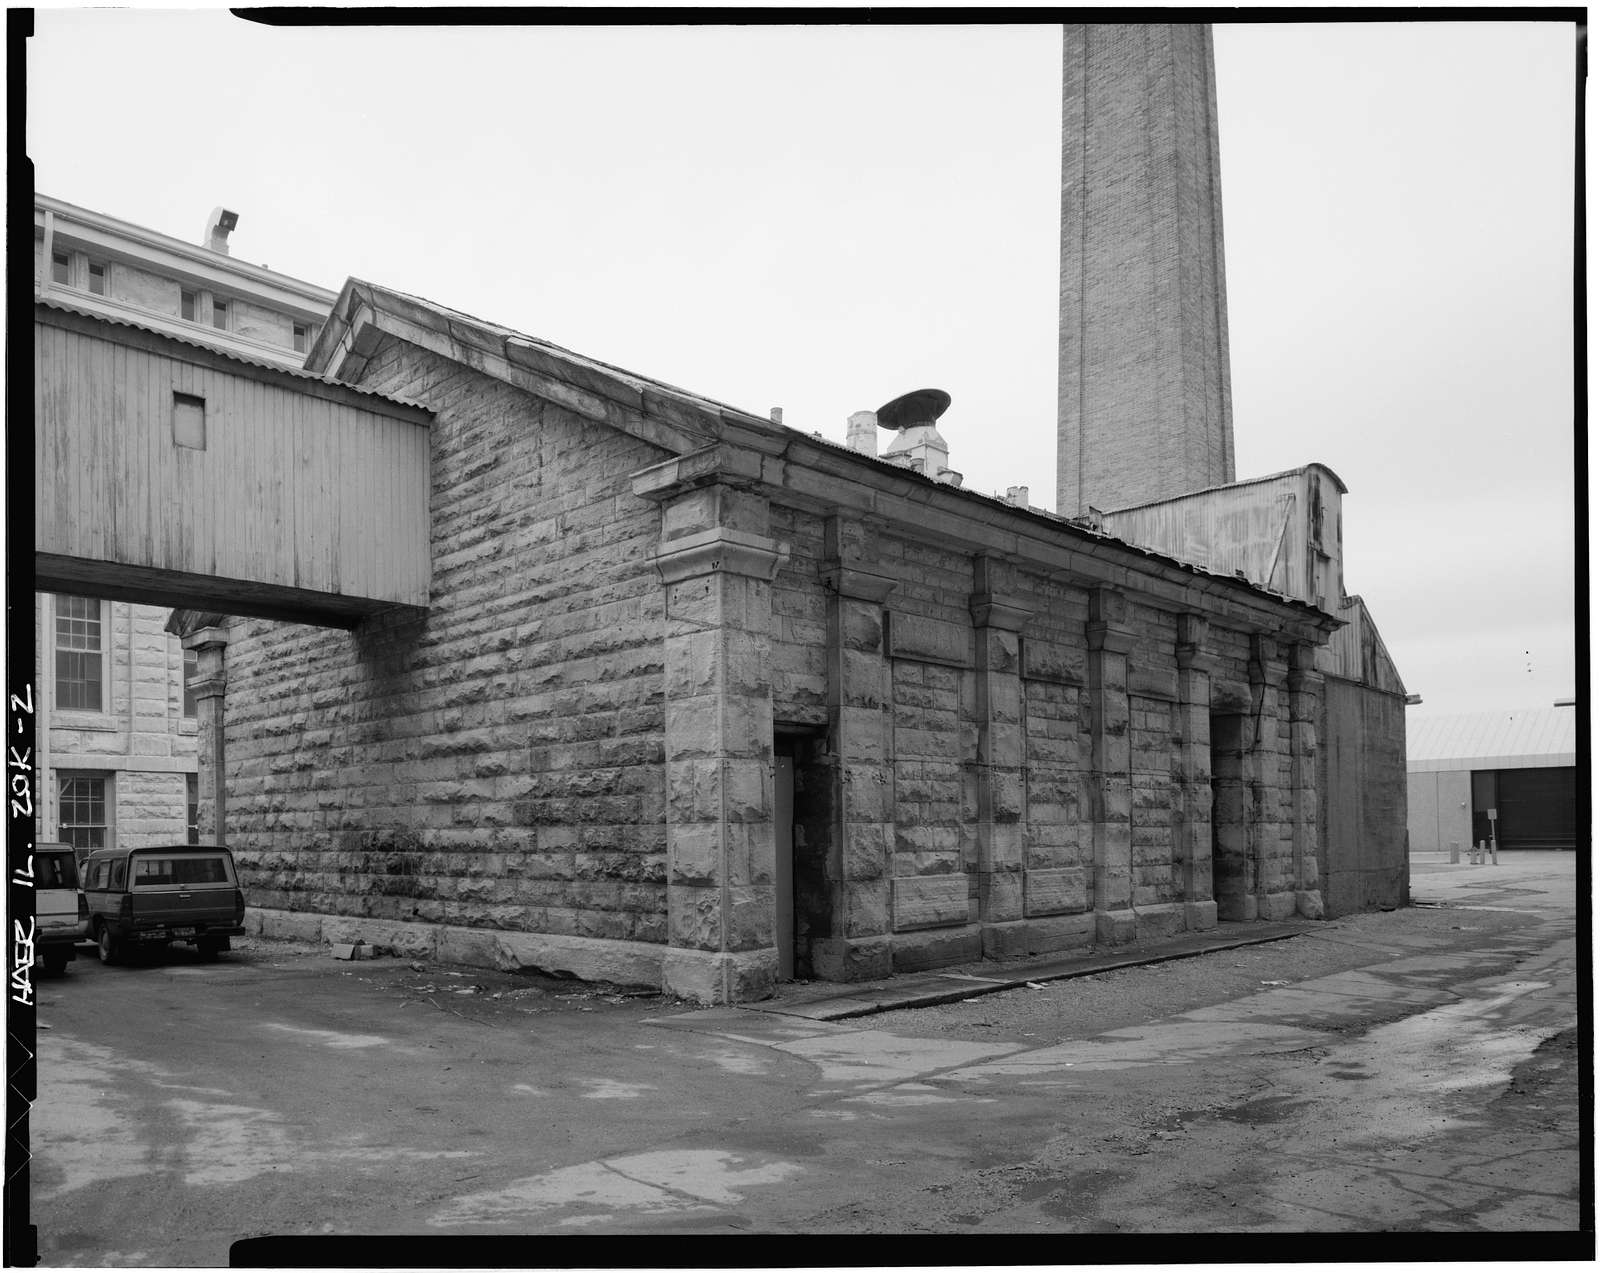 Rock Island Arsenal, Building No. 105, South Avenue between Gillespie Avenue & Second Street, Rock Island, Rock Island County, IL